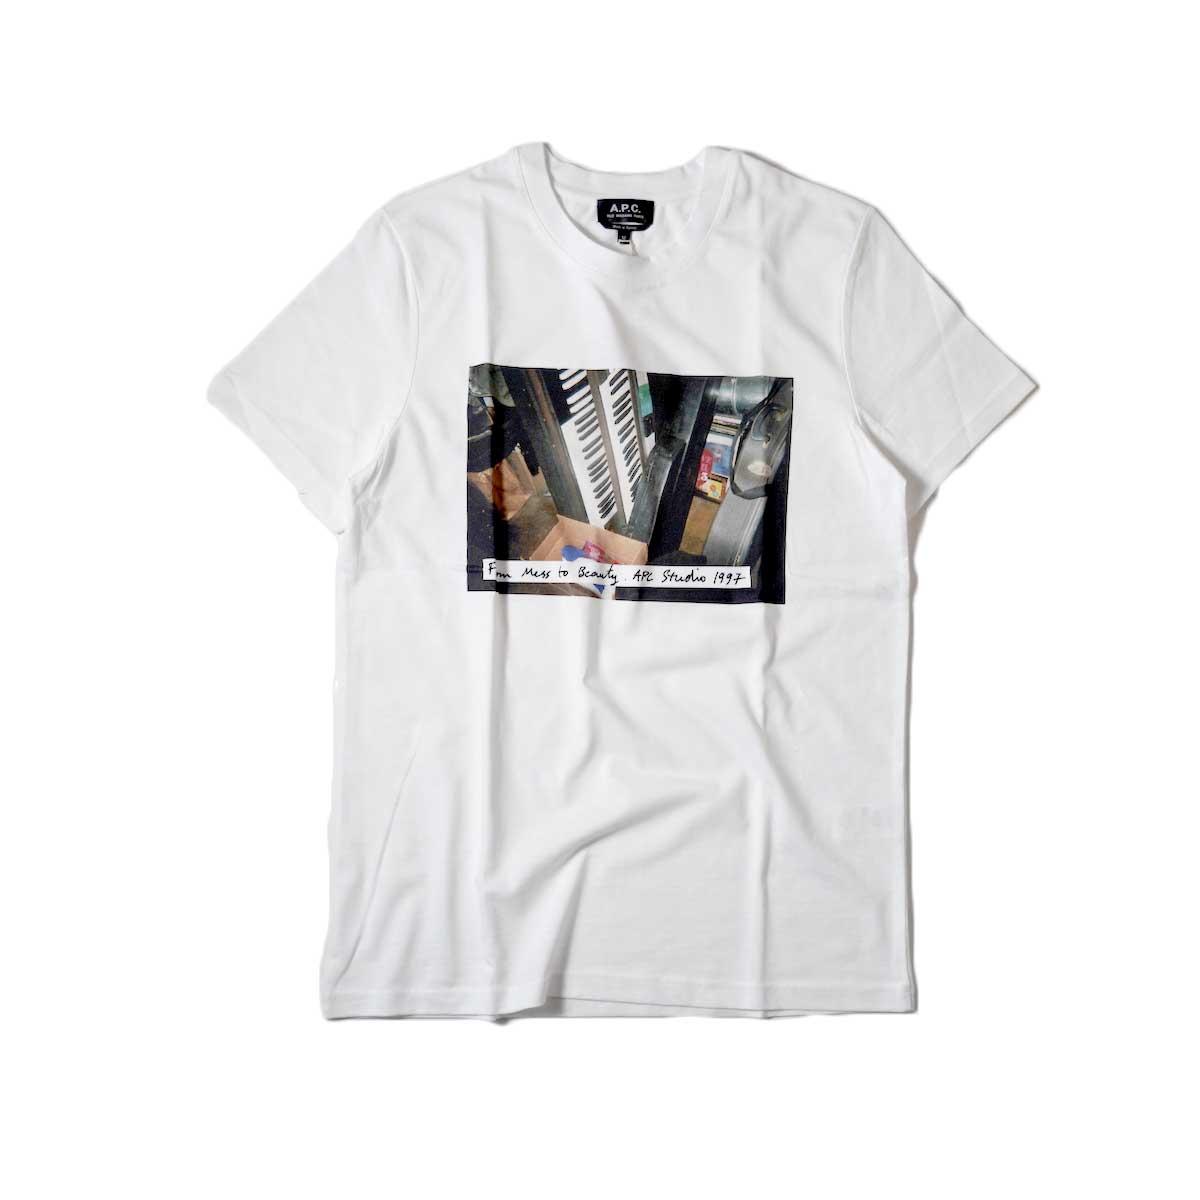 A.P.C. / Jacques Tシャツ (White)